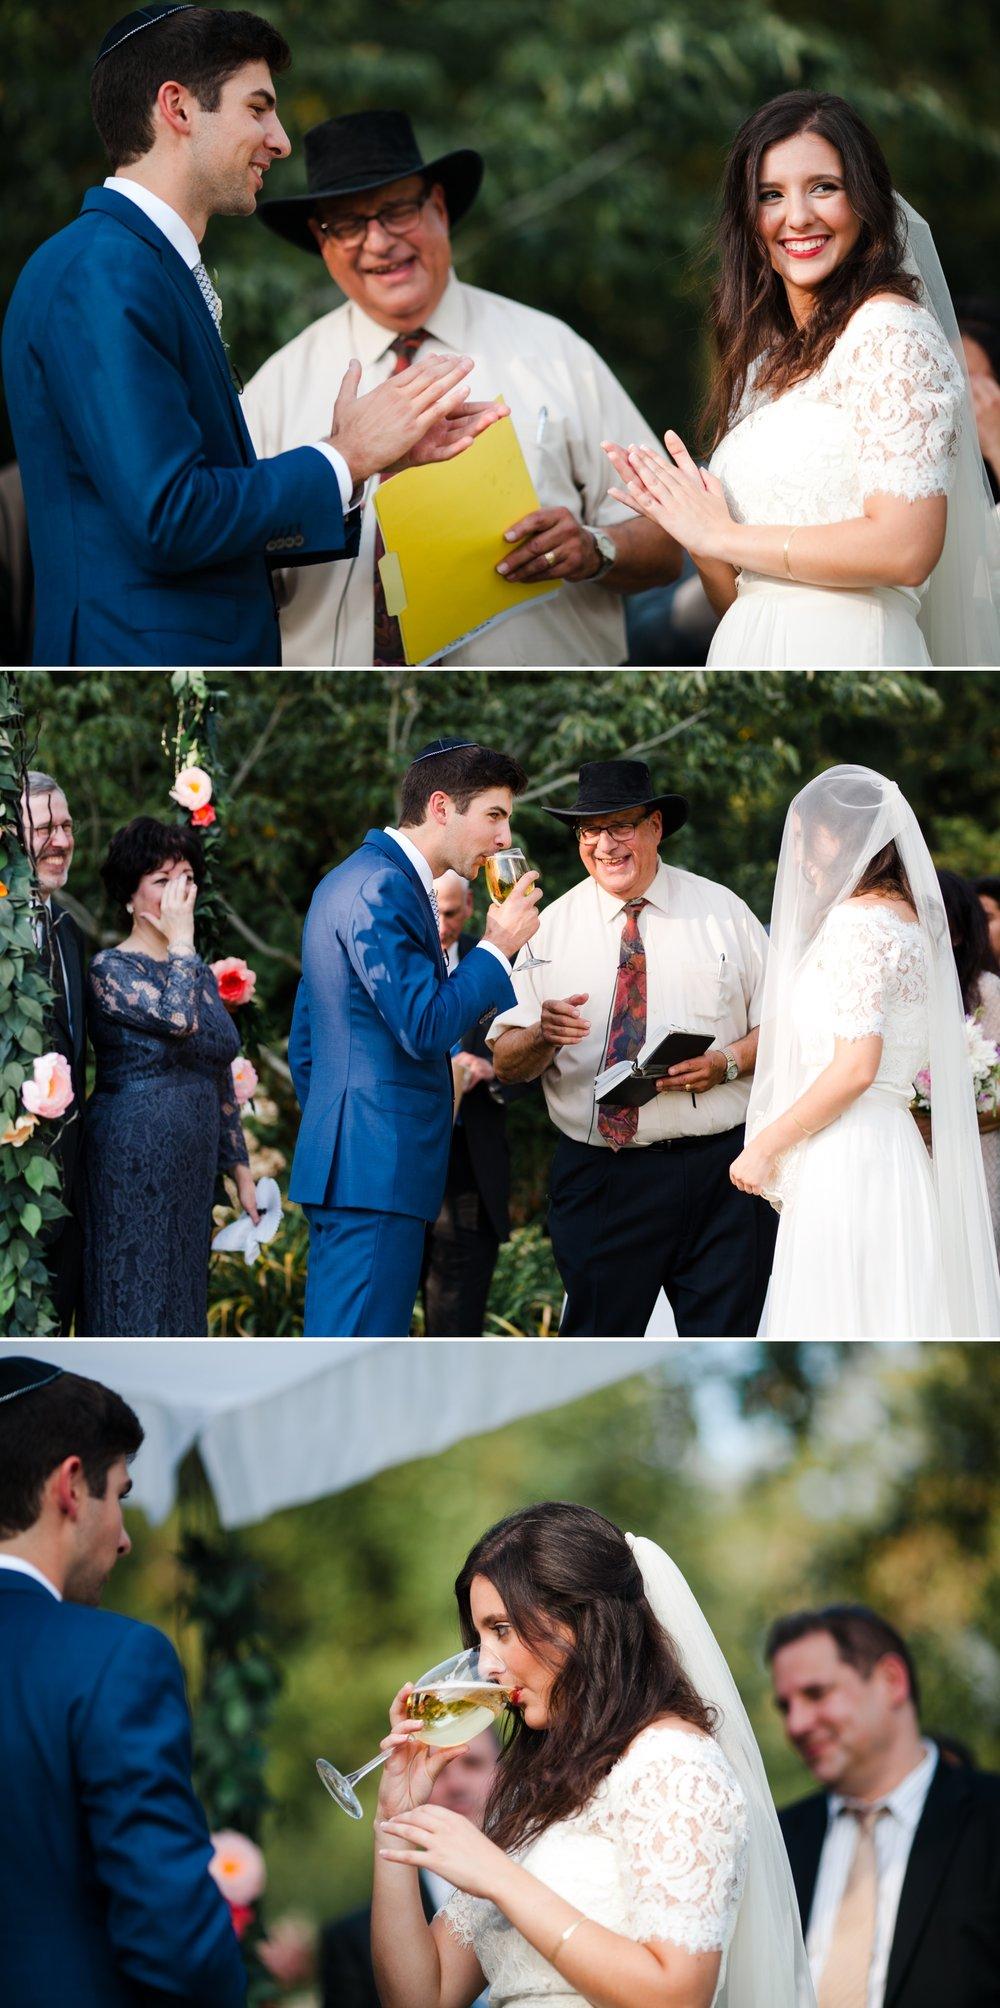 13-jewish-wedding-cove-normandy-park-seattle.jpg